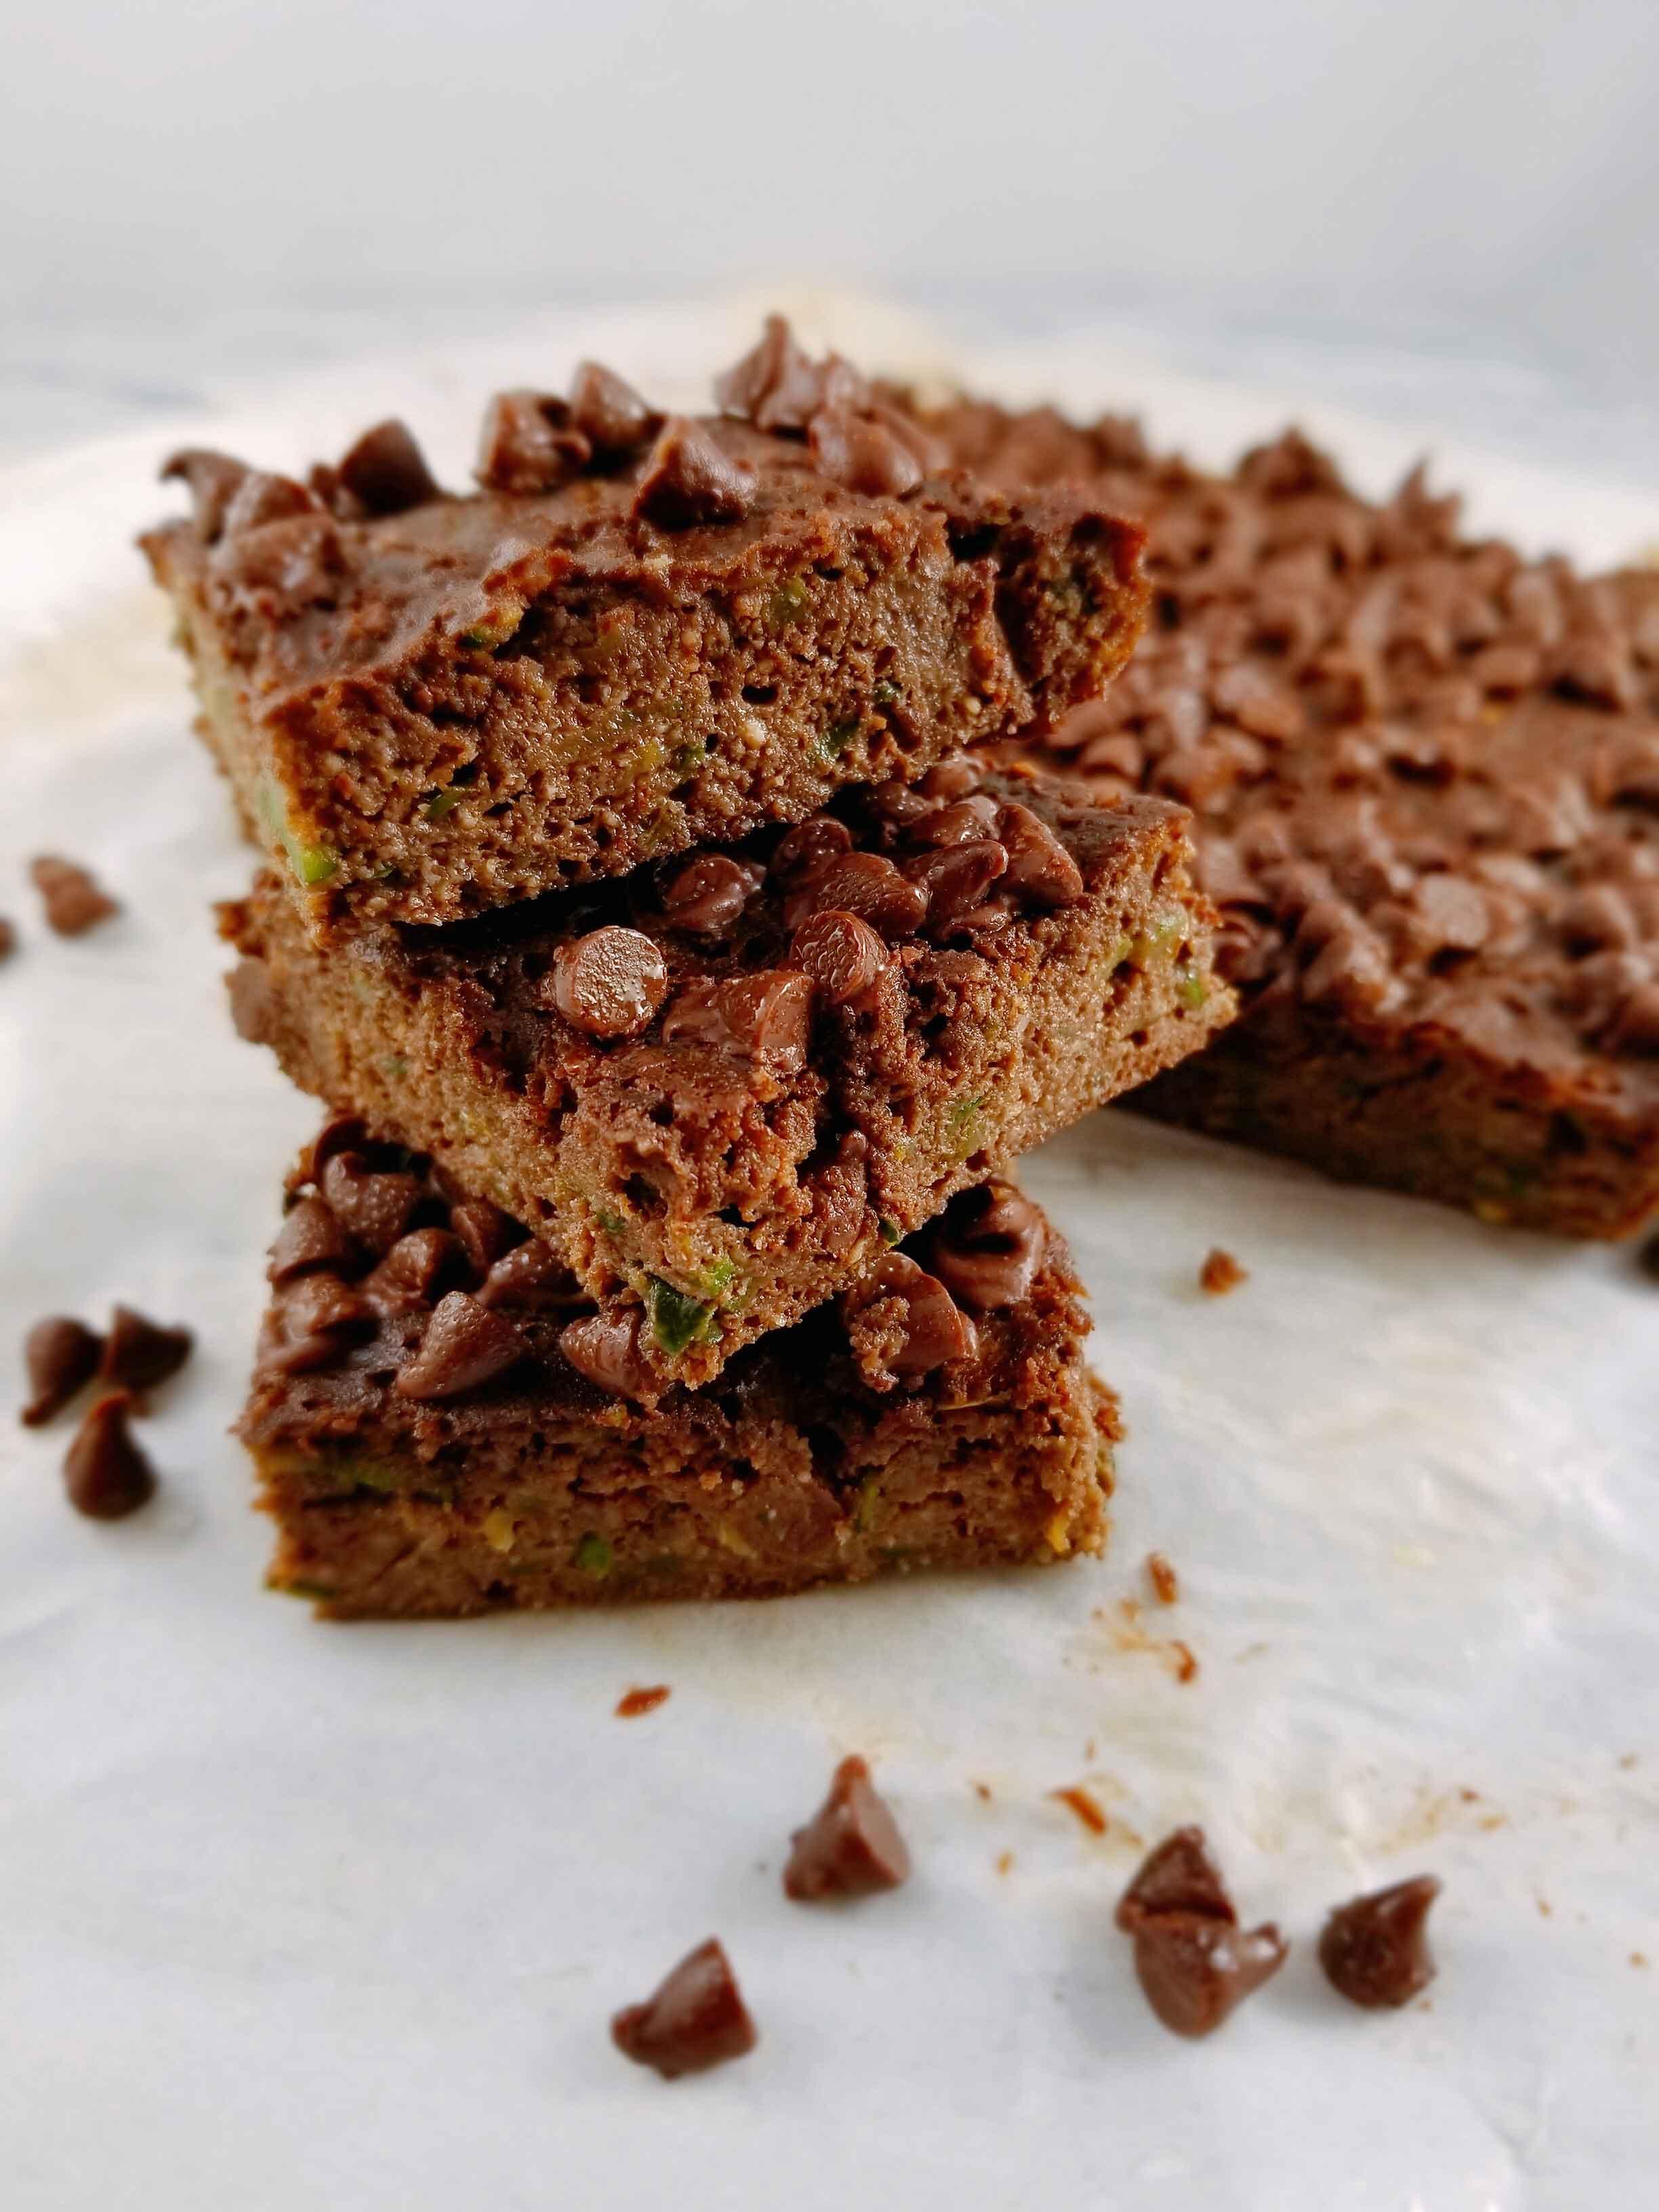 ashly-locklin-flourless-zucchini-brownies.jpg